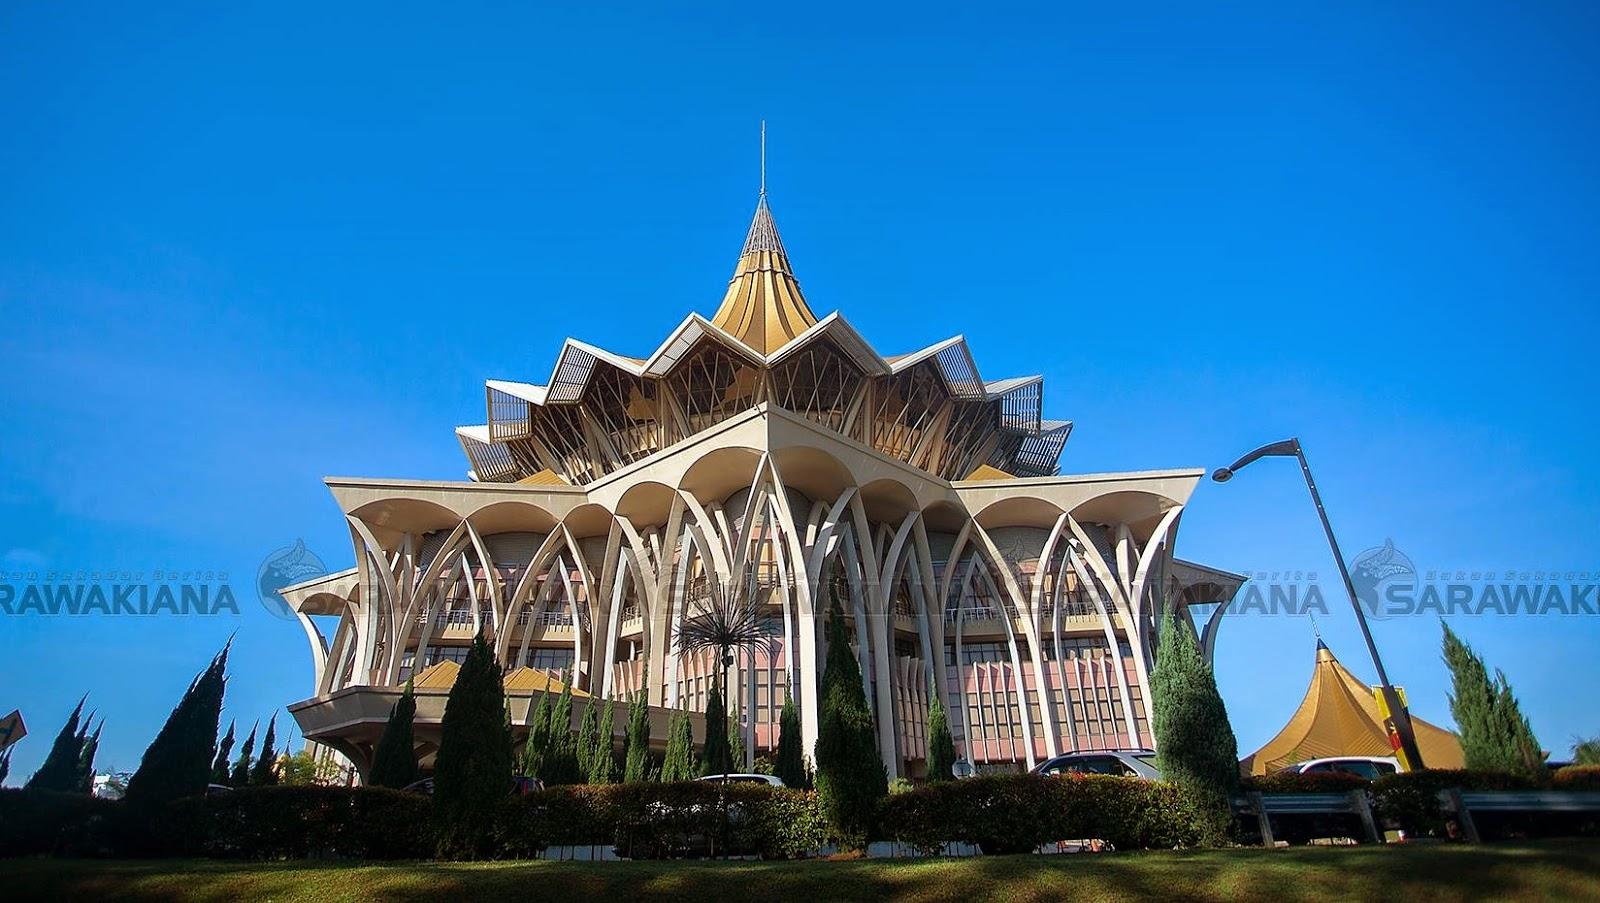 Pembinaan Lebuh Raya Pan Borneo